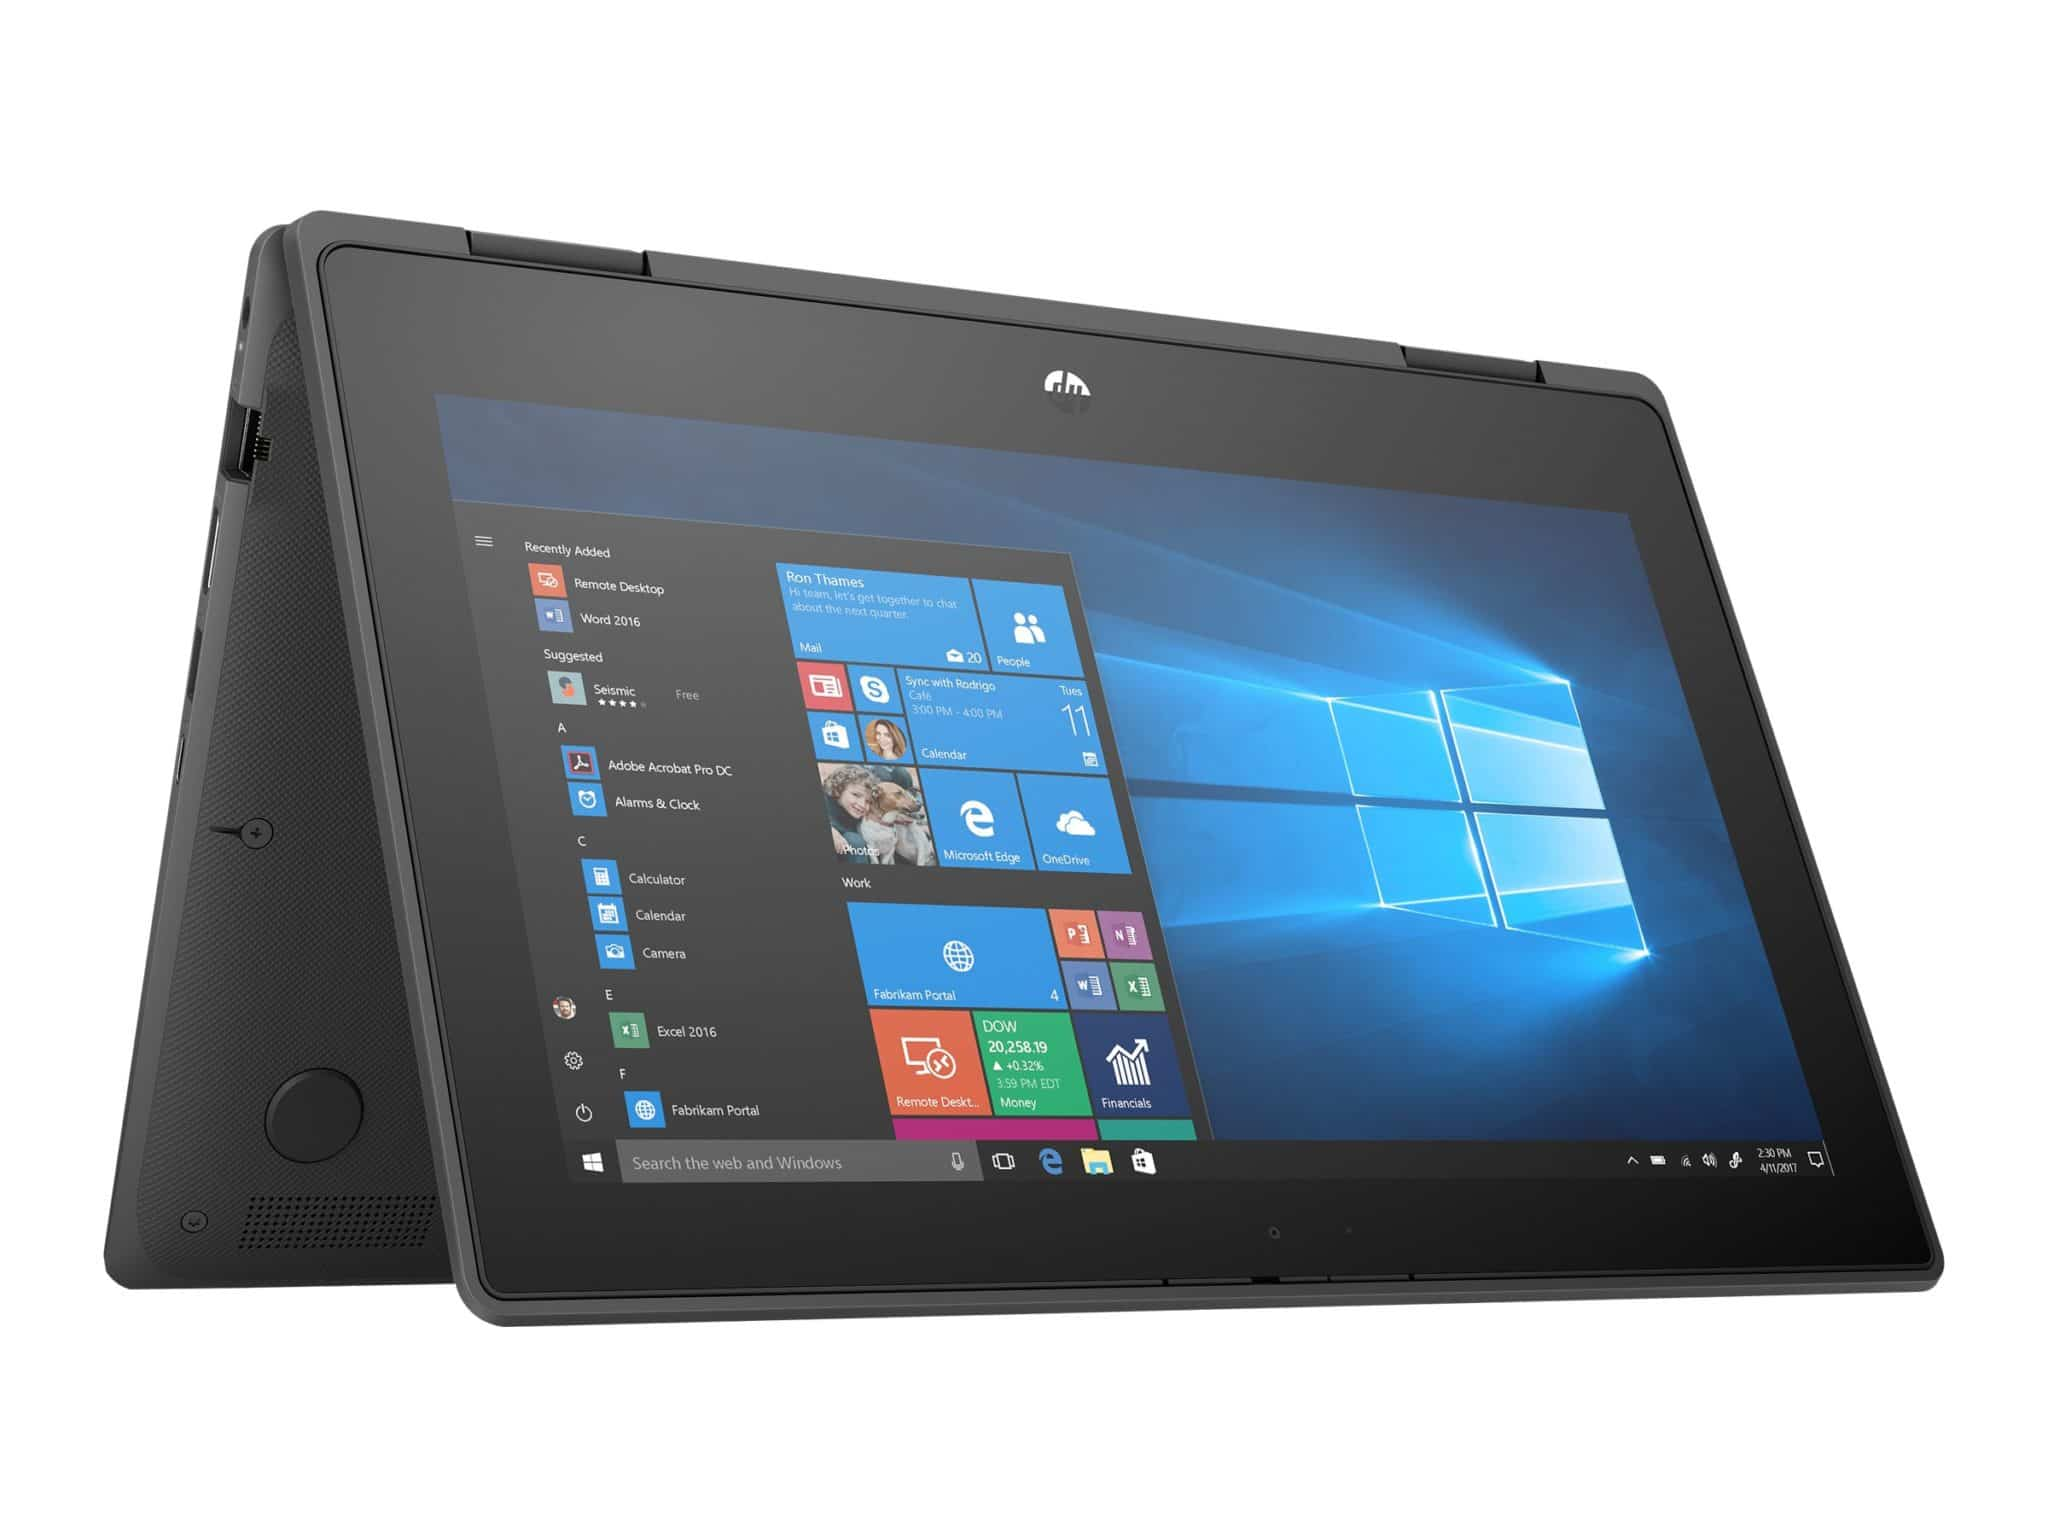 "HP ProBook x360 11 G5 - Smart Buy - Education Edition - 11.6"" - Celeron N4120 - 4 GB RAM - 128 GB SSD - Notebook"